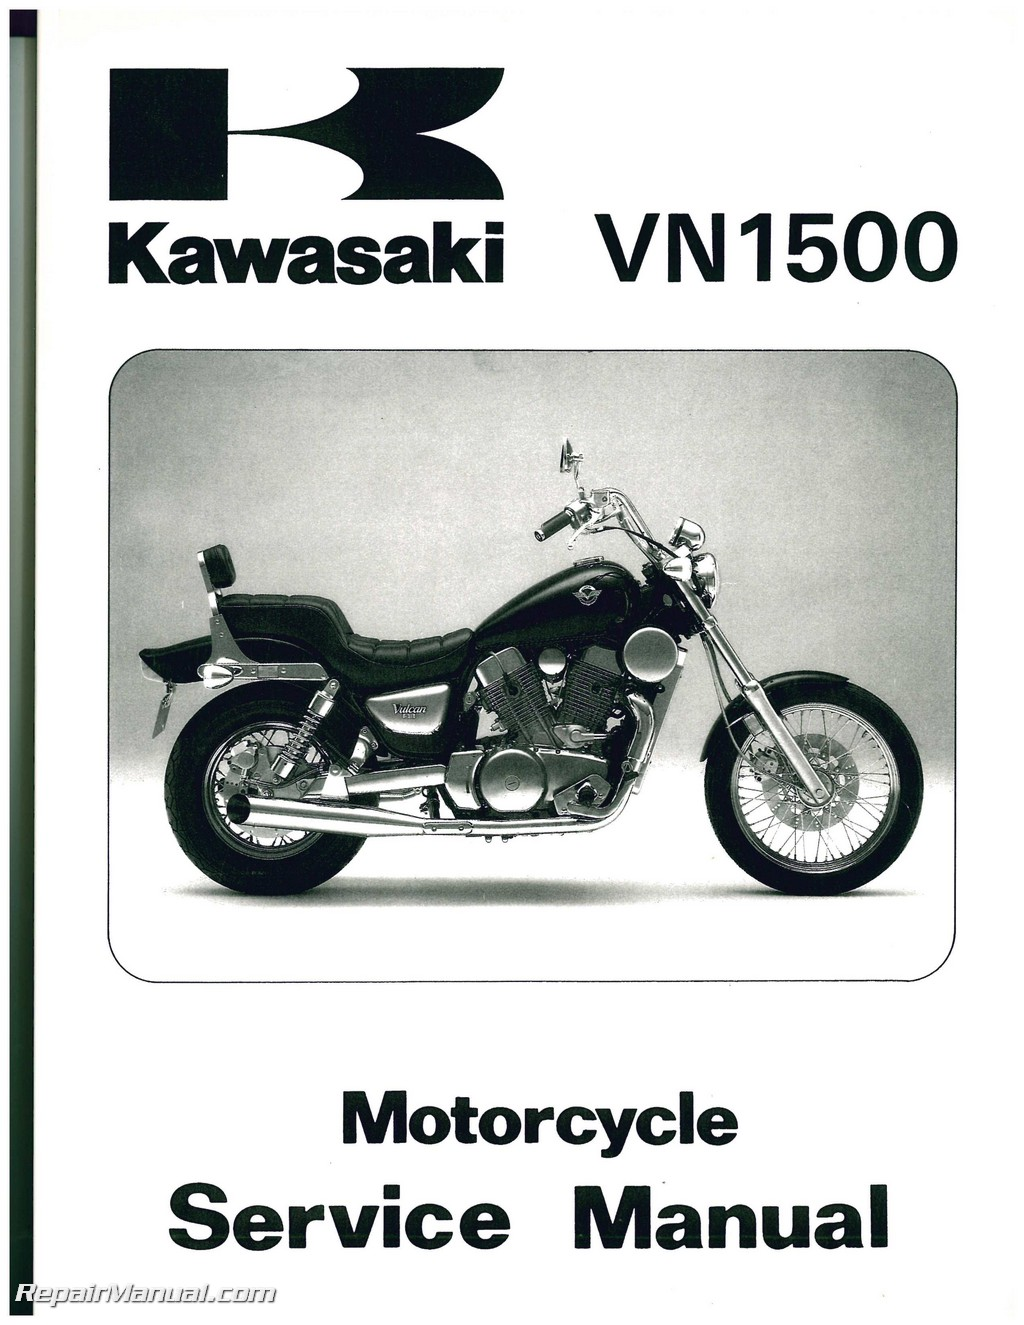 1987 2004 kawasaki vulcan vulcan classic 1500 motorcycle service manual rh repairmanual com 2004 kawasaki vulcan 1500 classic service manual 1996 kawasaki vulcan 1500 classic service manual